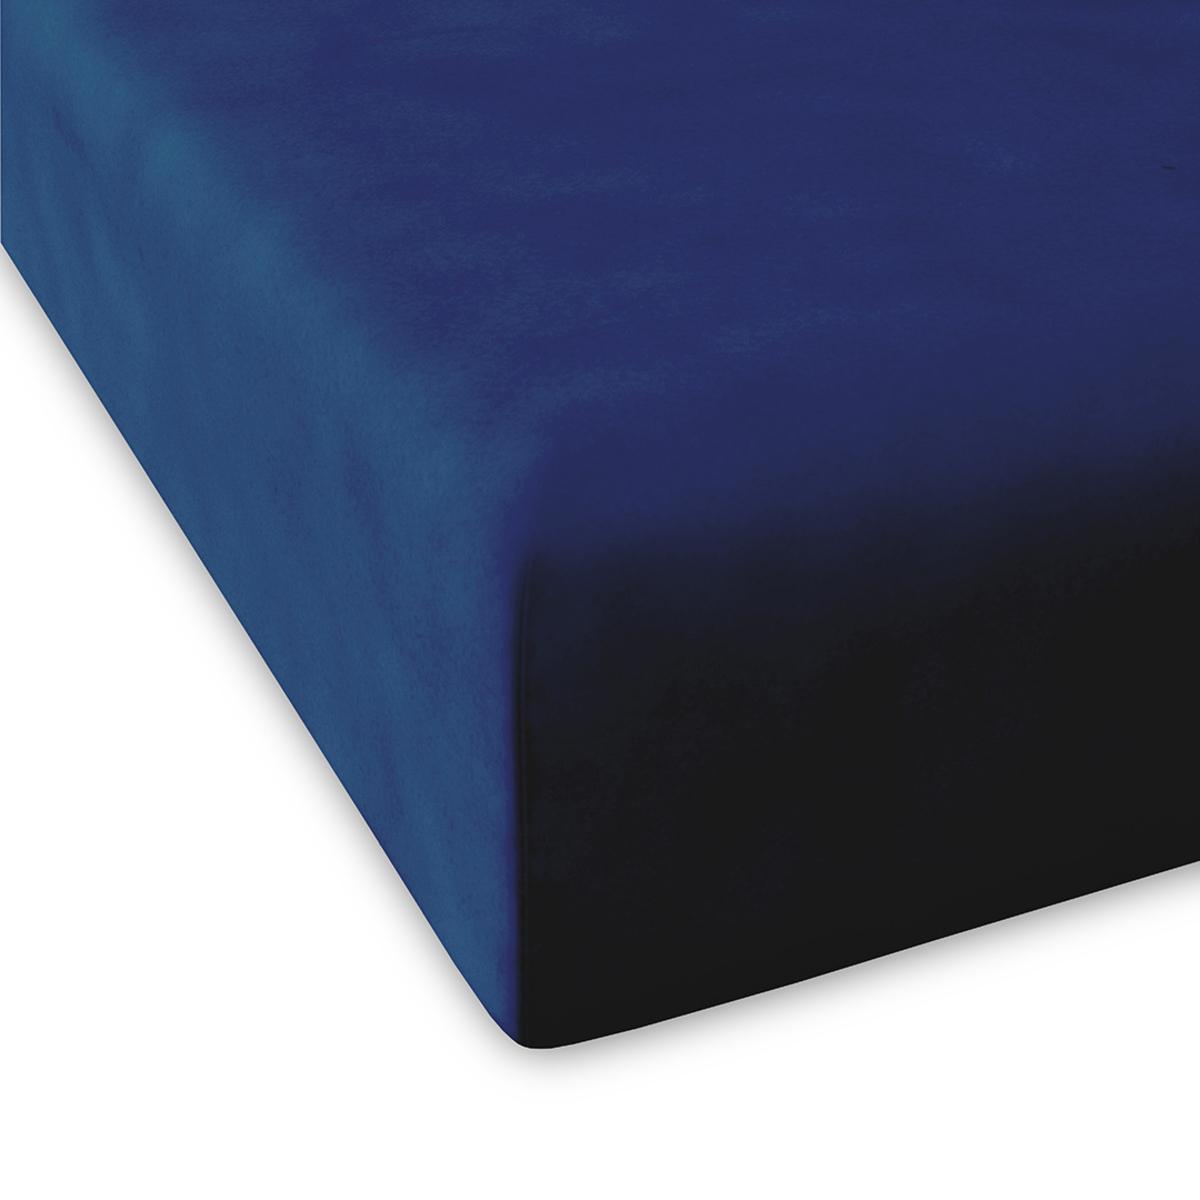 Drap housse en coton bleu marine 140x200